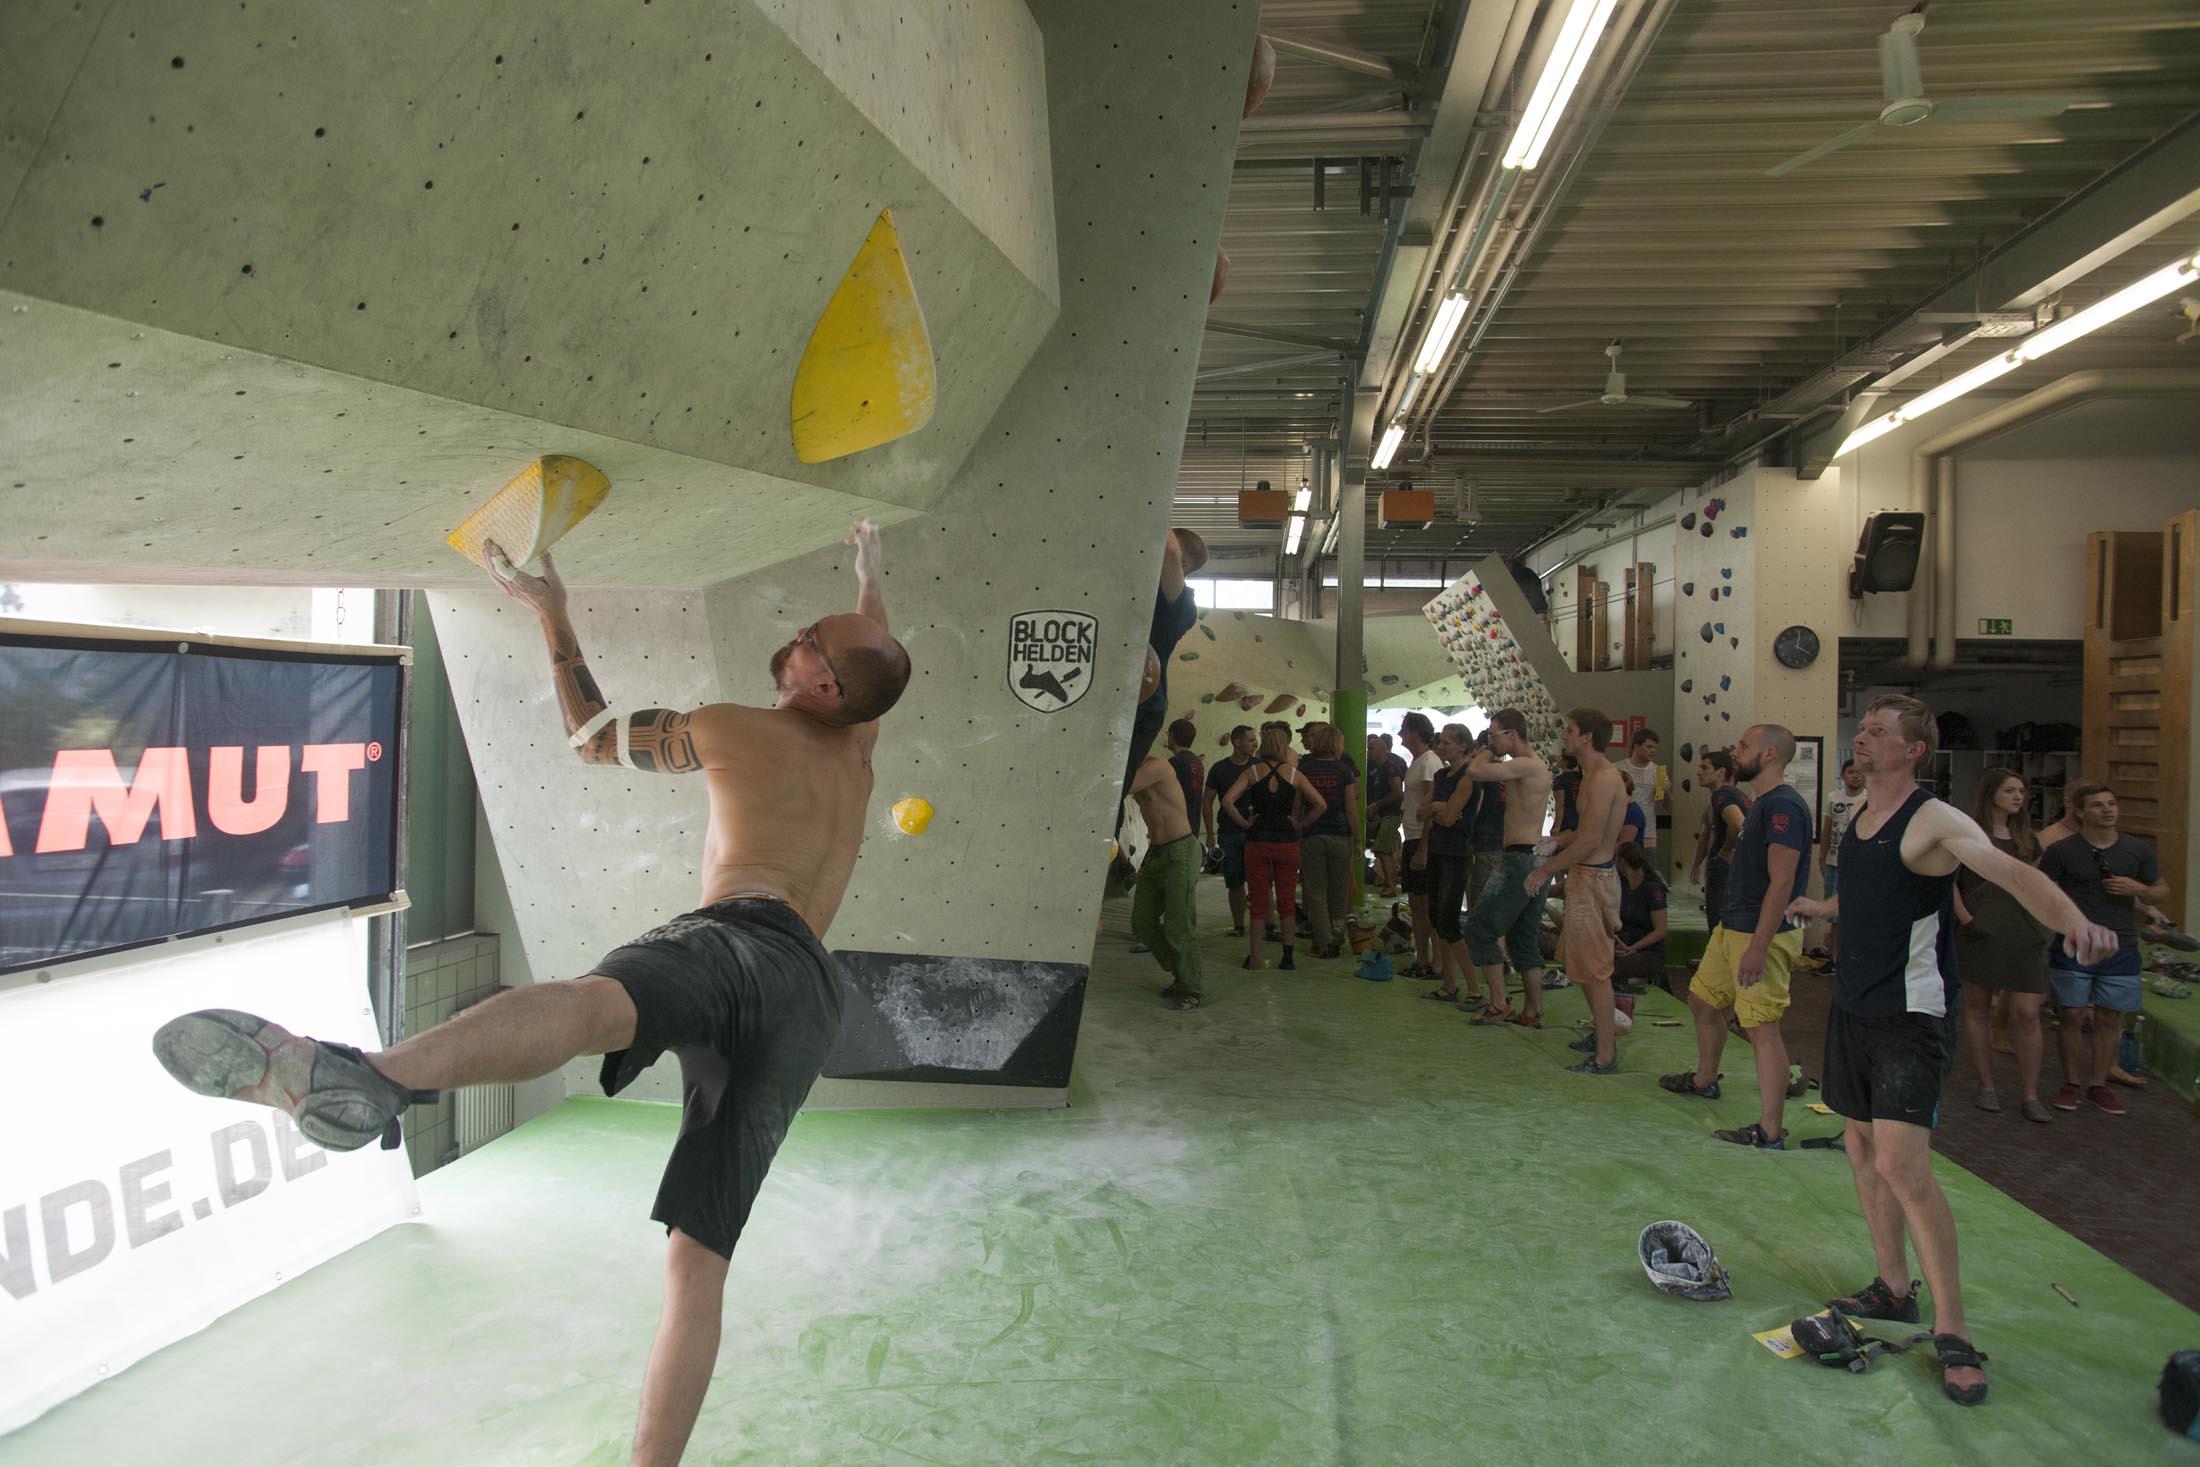 Quali, internationaler bouldercup Frankenjura 2016, BLOCKHELDEN Erlangen, Mammut, Bergfreunde.de, Boulderwettkampf07092016401